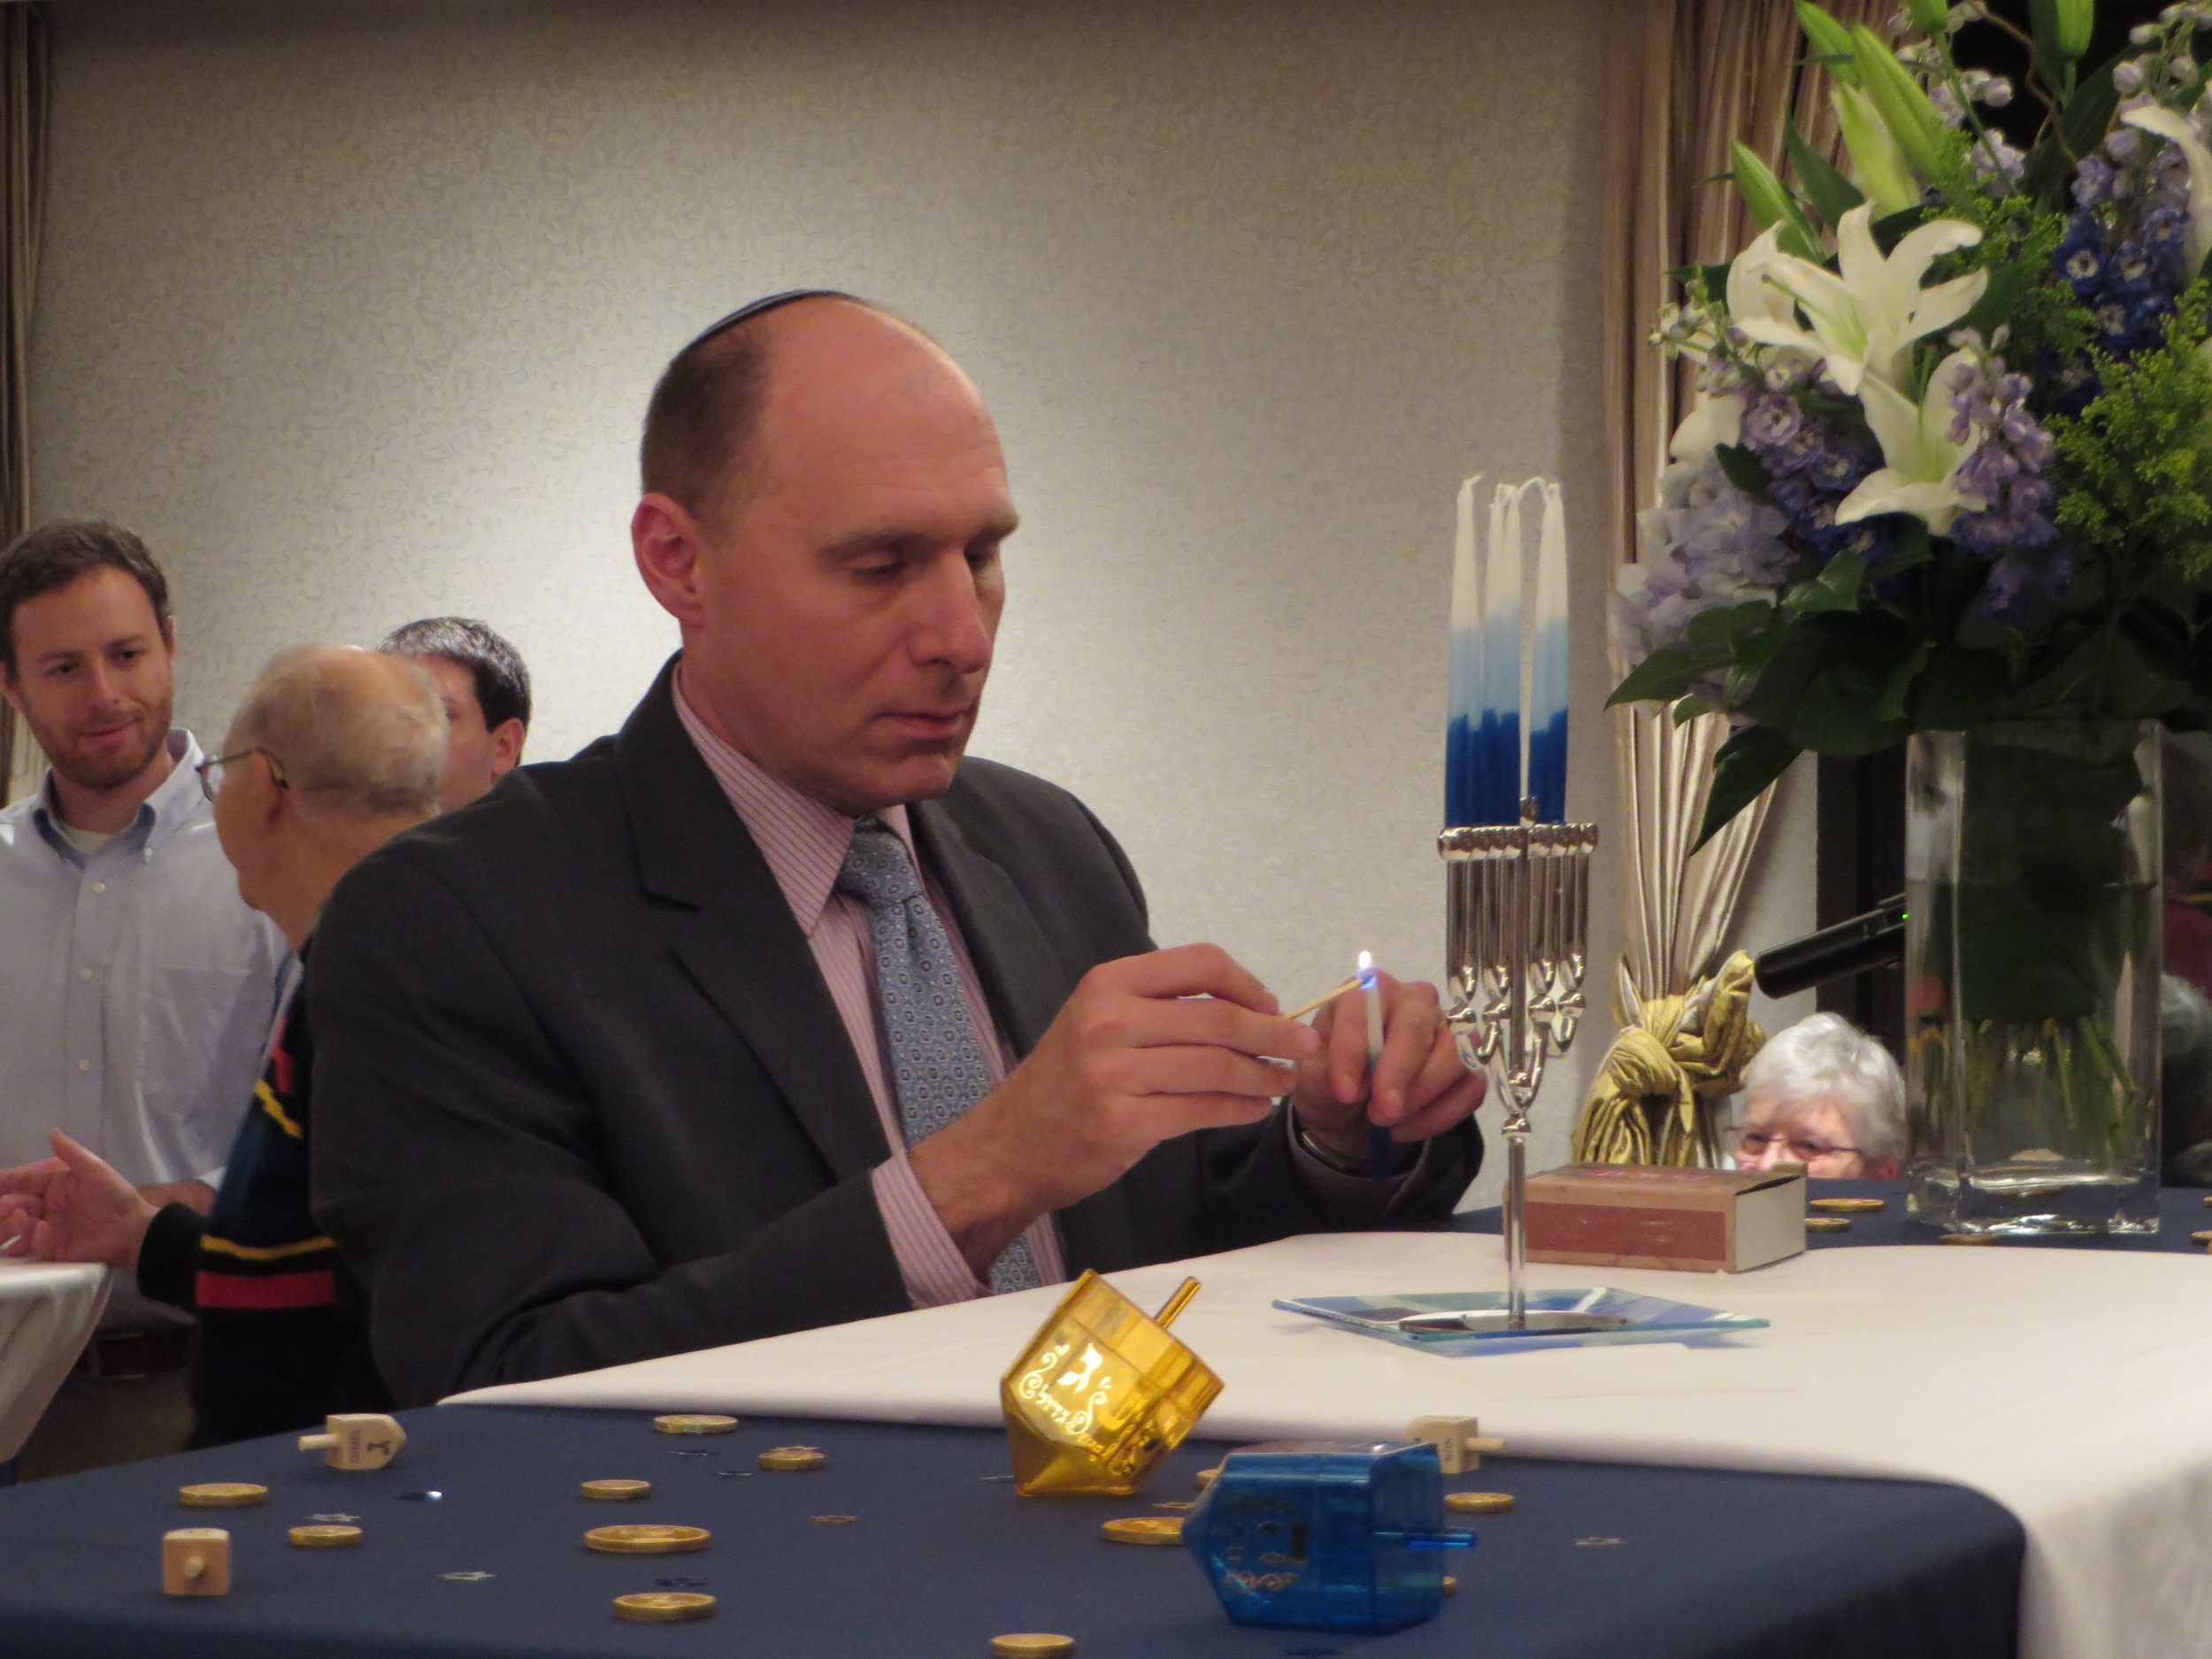 Alan Ronkin, Director, AJC Washington, D.C., lights the candles of the Menorah